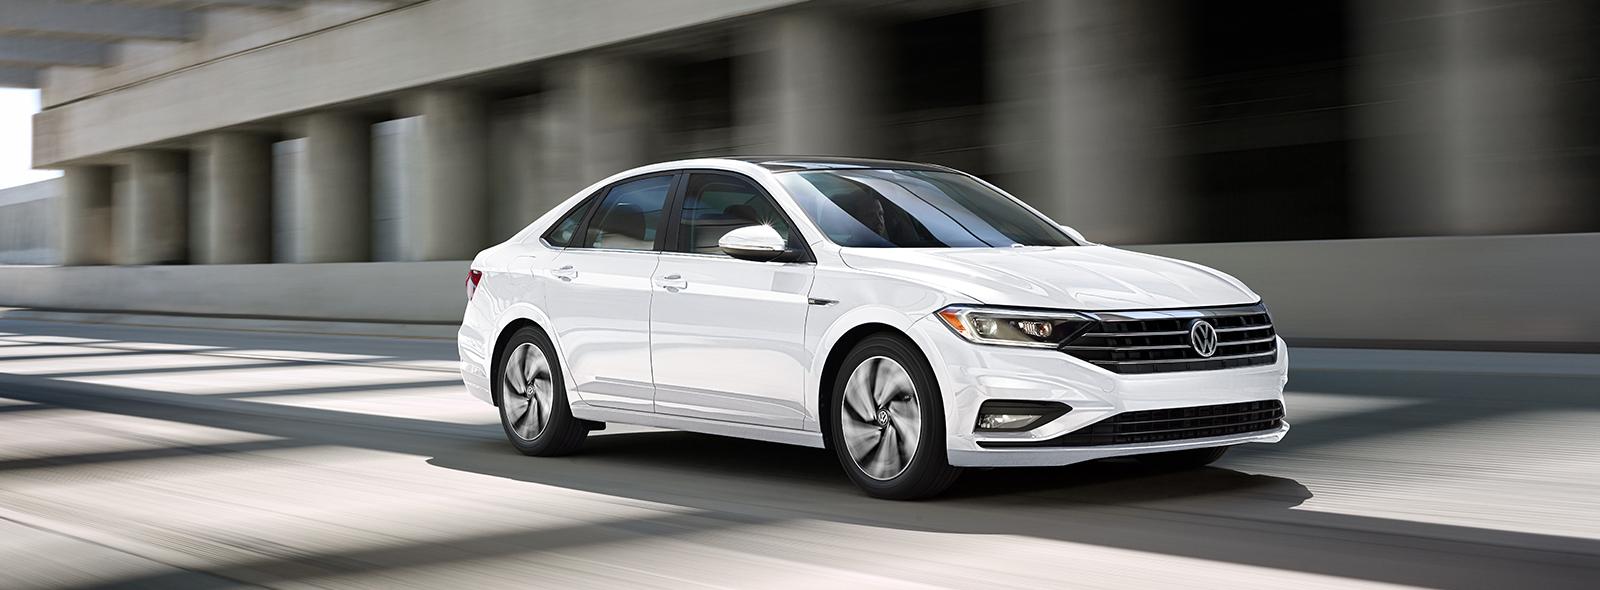 2020 Volkswagen Jetta Trim Levels near Alexandria, VA